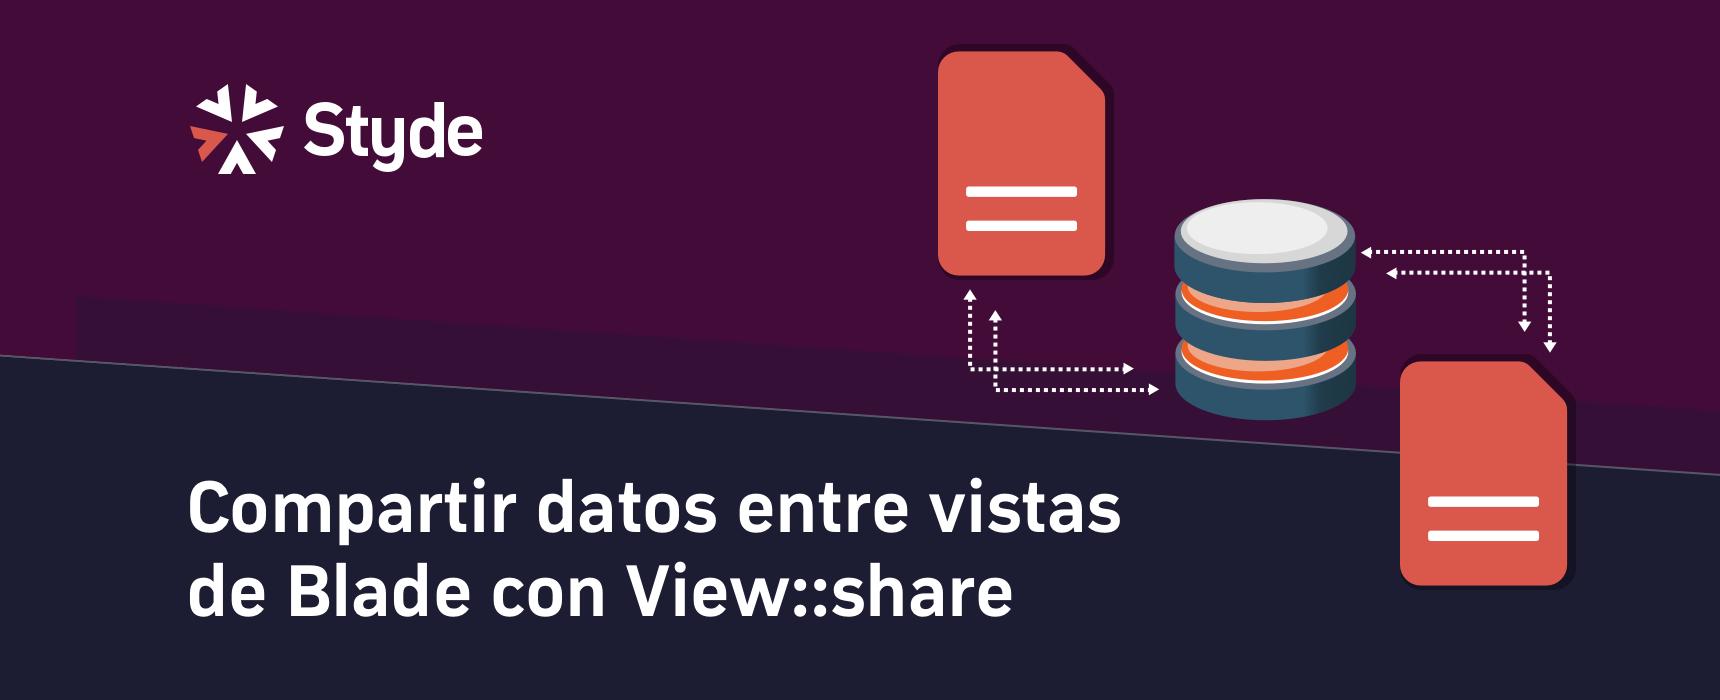 Compartir datos entre vistas de Laravel Blade con View